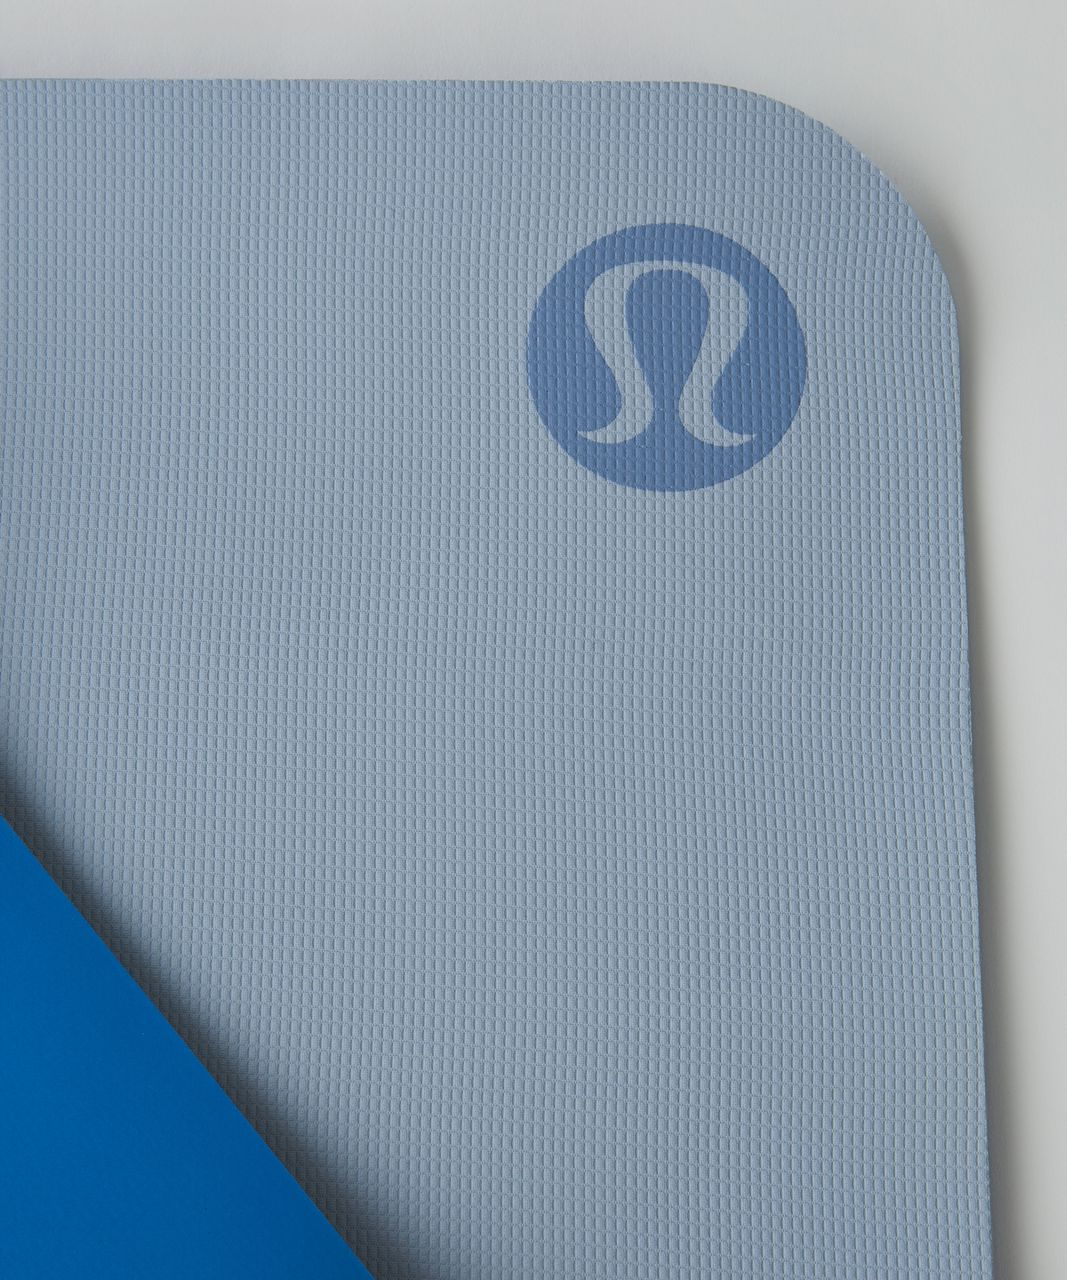 Lululemon The Reversible Mat 5mm - Porcelaine / Chalk